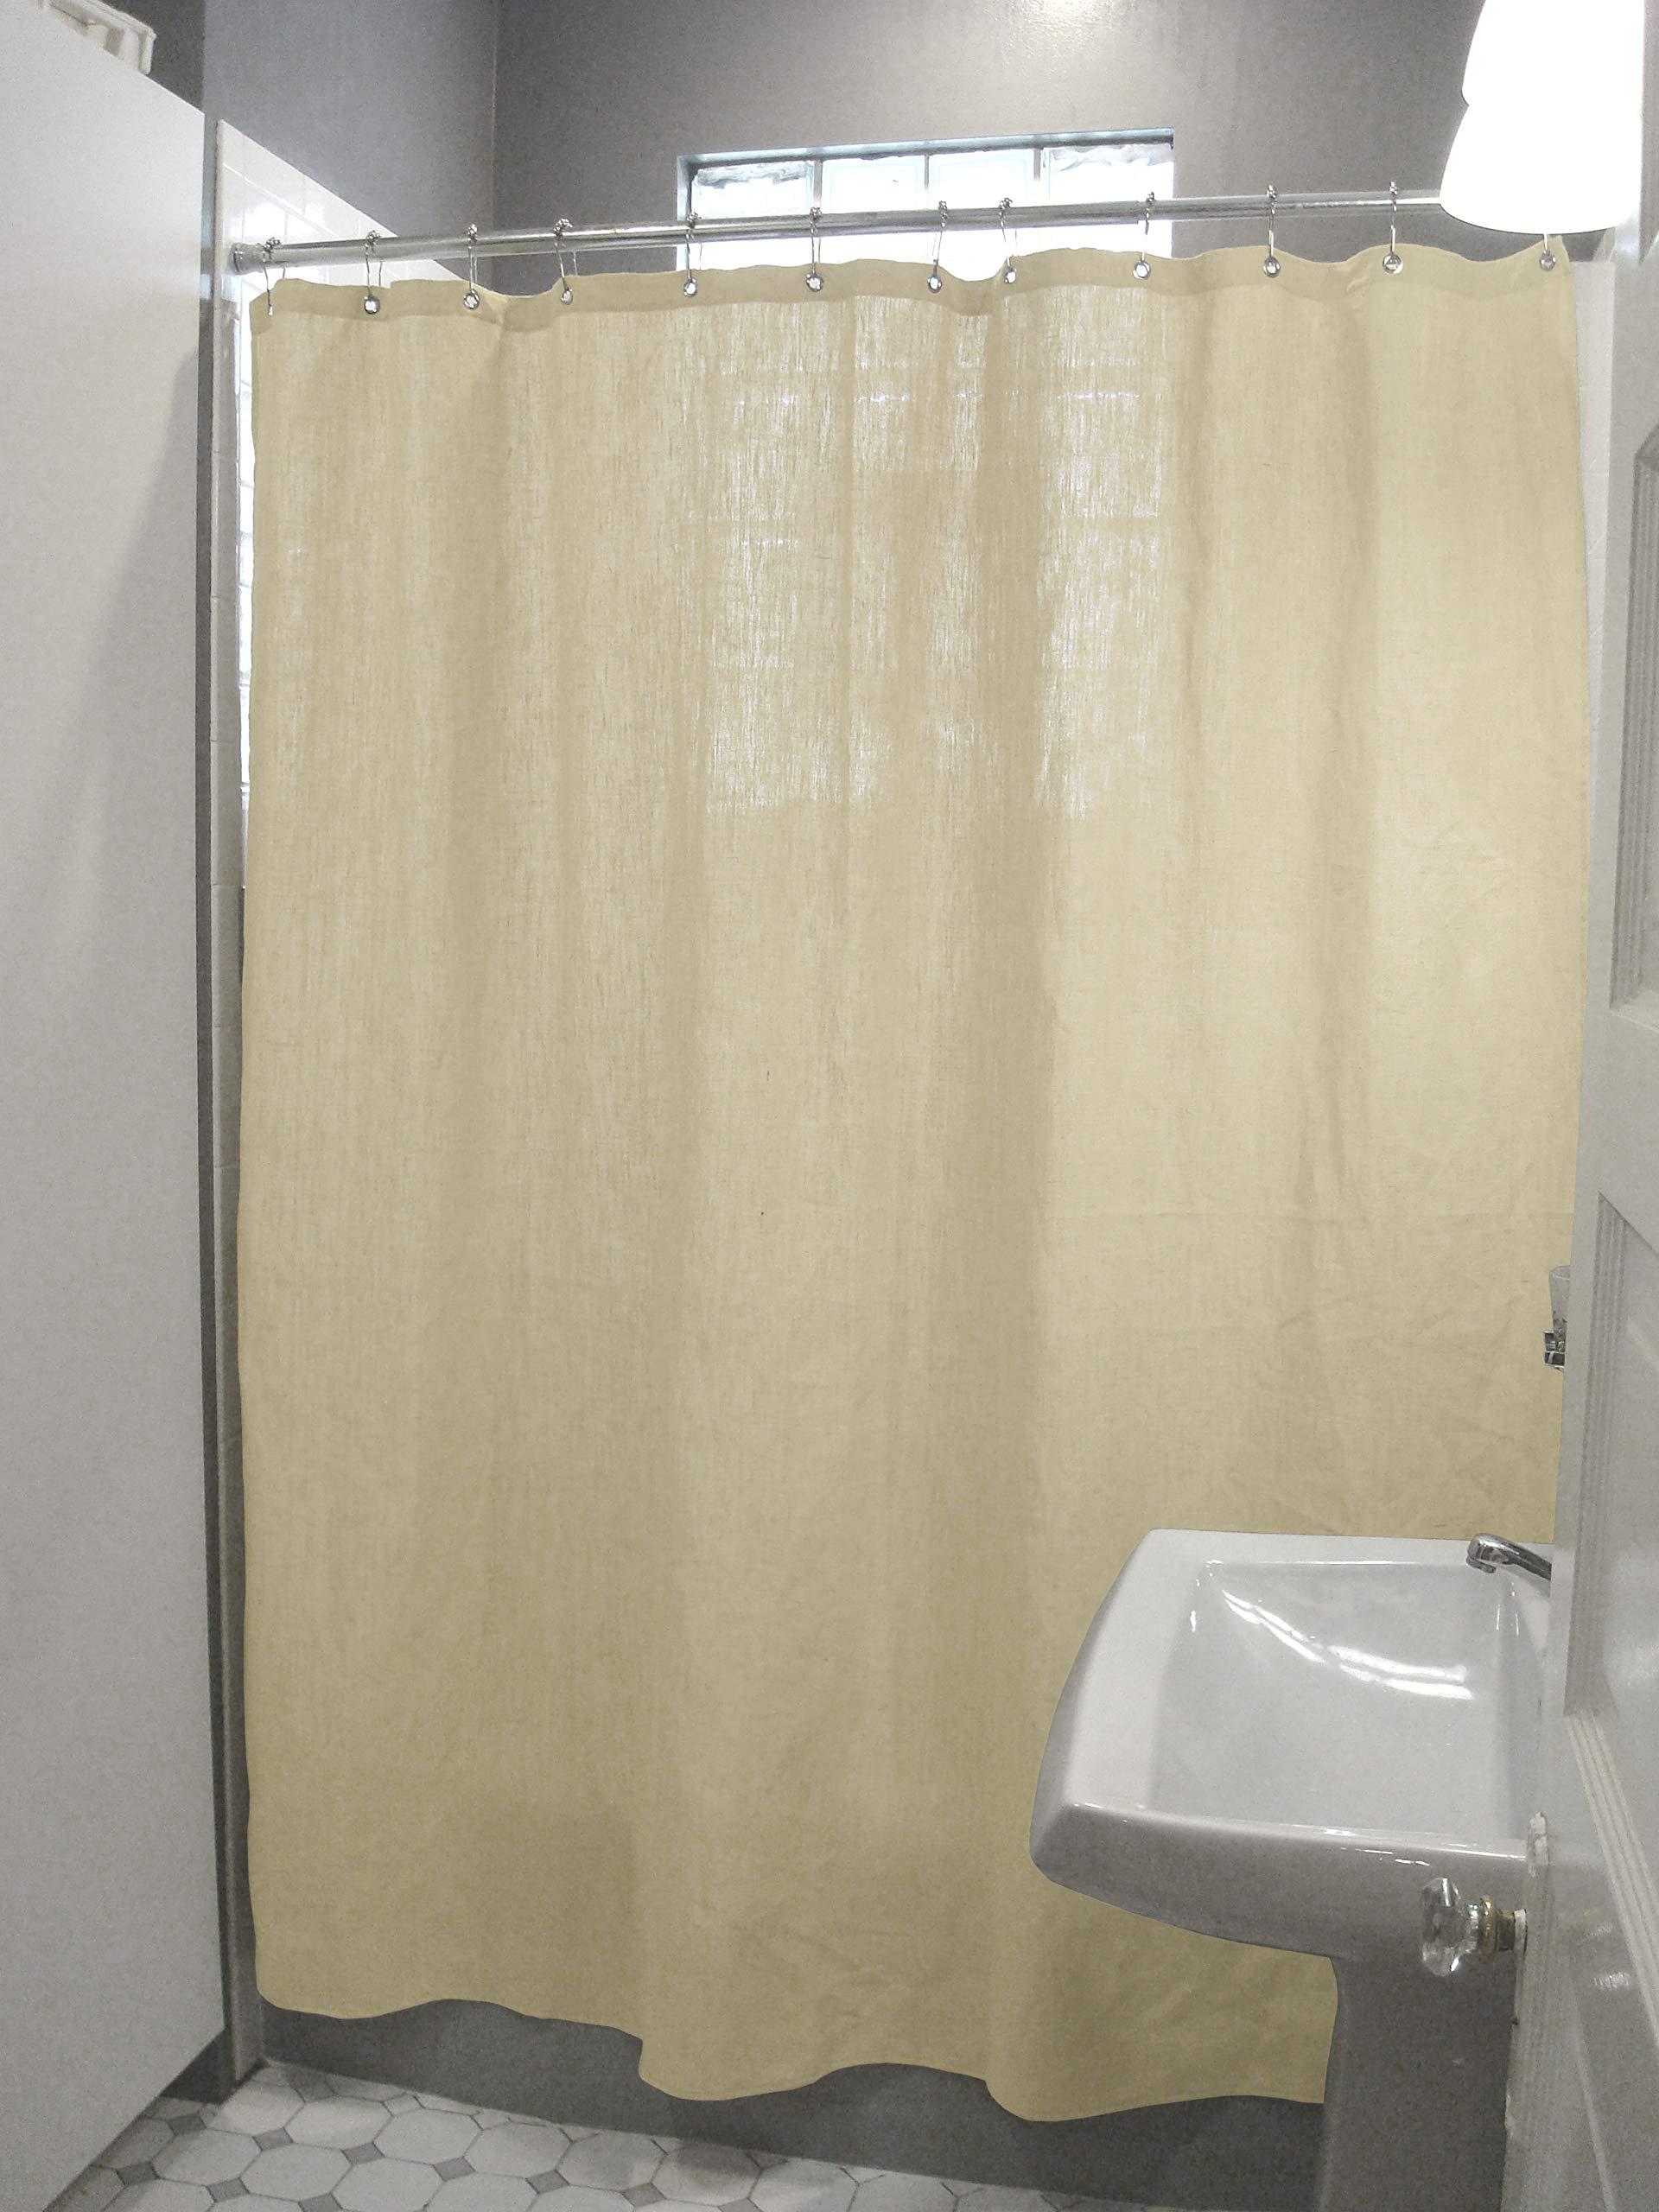 Bean Products Hemp Shower Curtain - 70'' x 74'' - Natural - Also Cotton, Hemp, Linen, Organic Cotton - Tub, Bath, Stall Sizes - Made in USA w/Rings